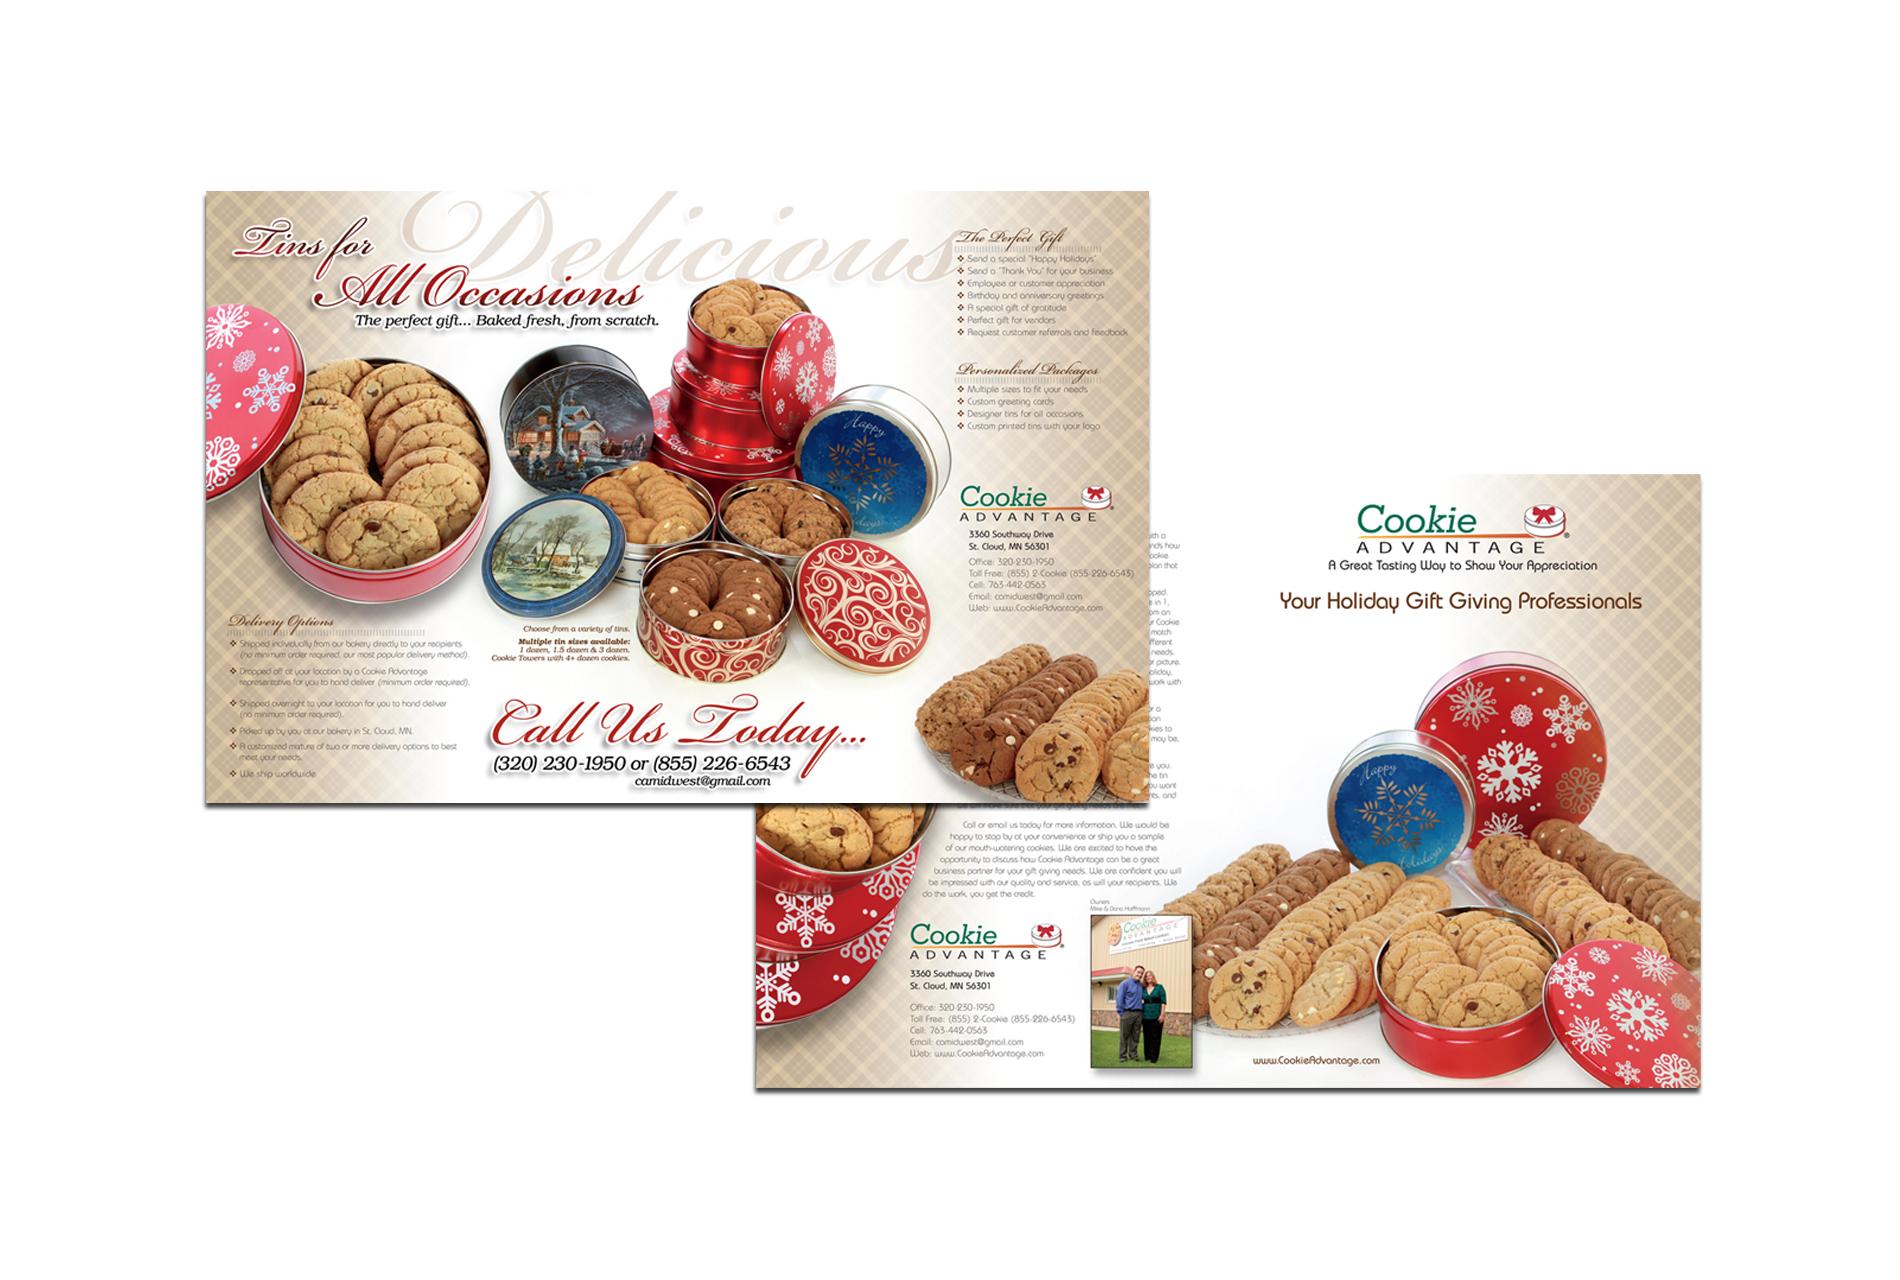 Cookie Advantage Sales Brochure